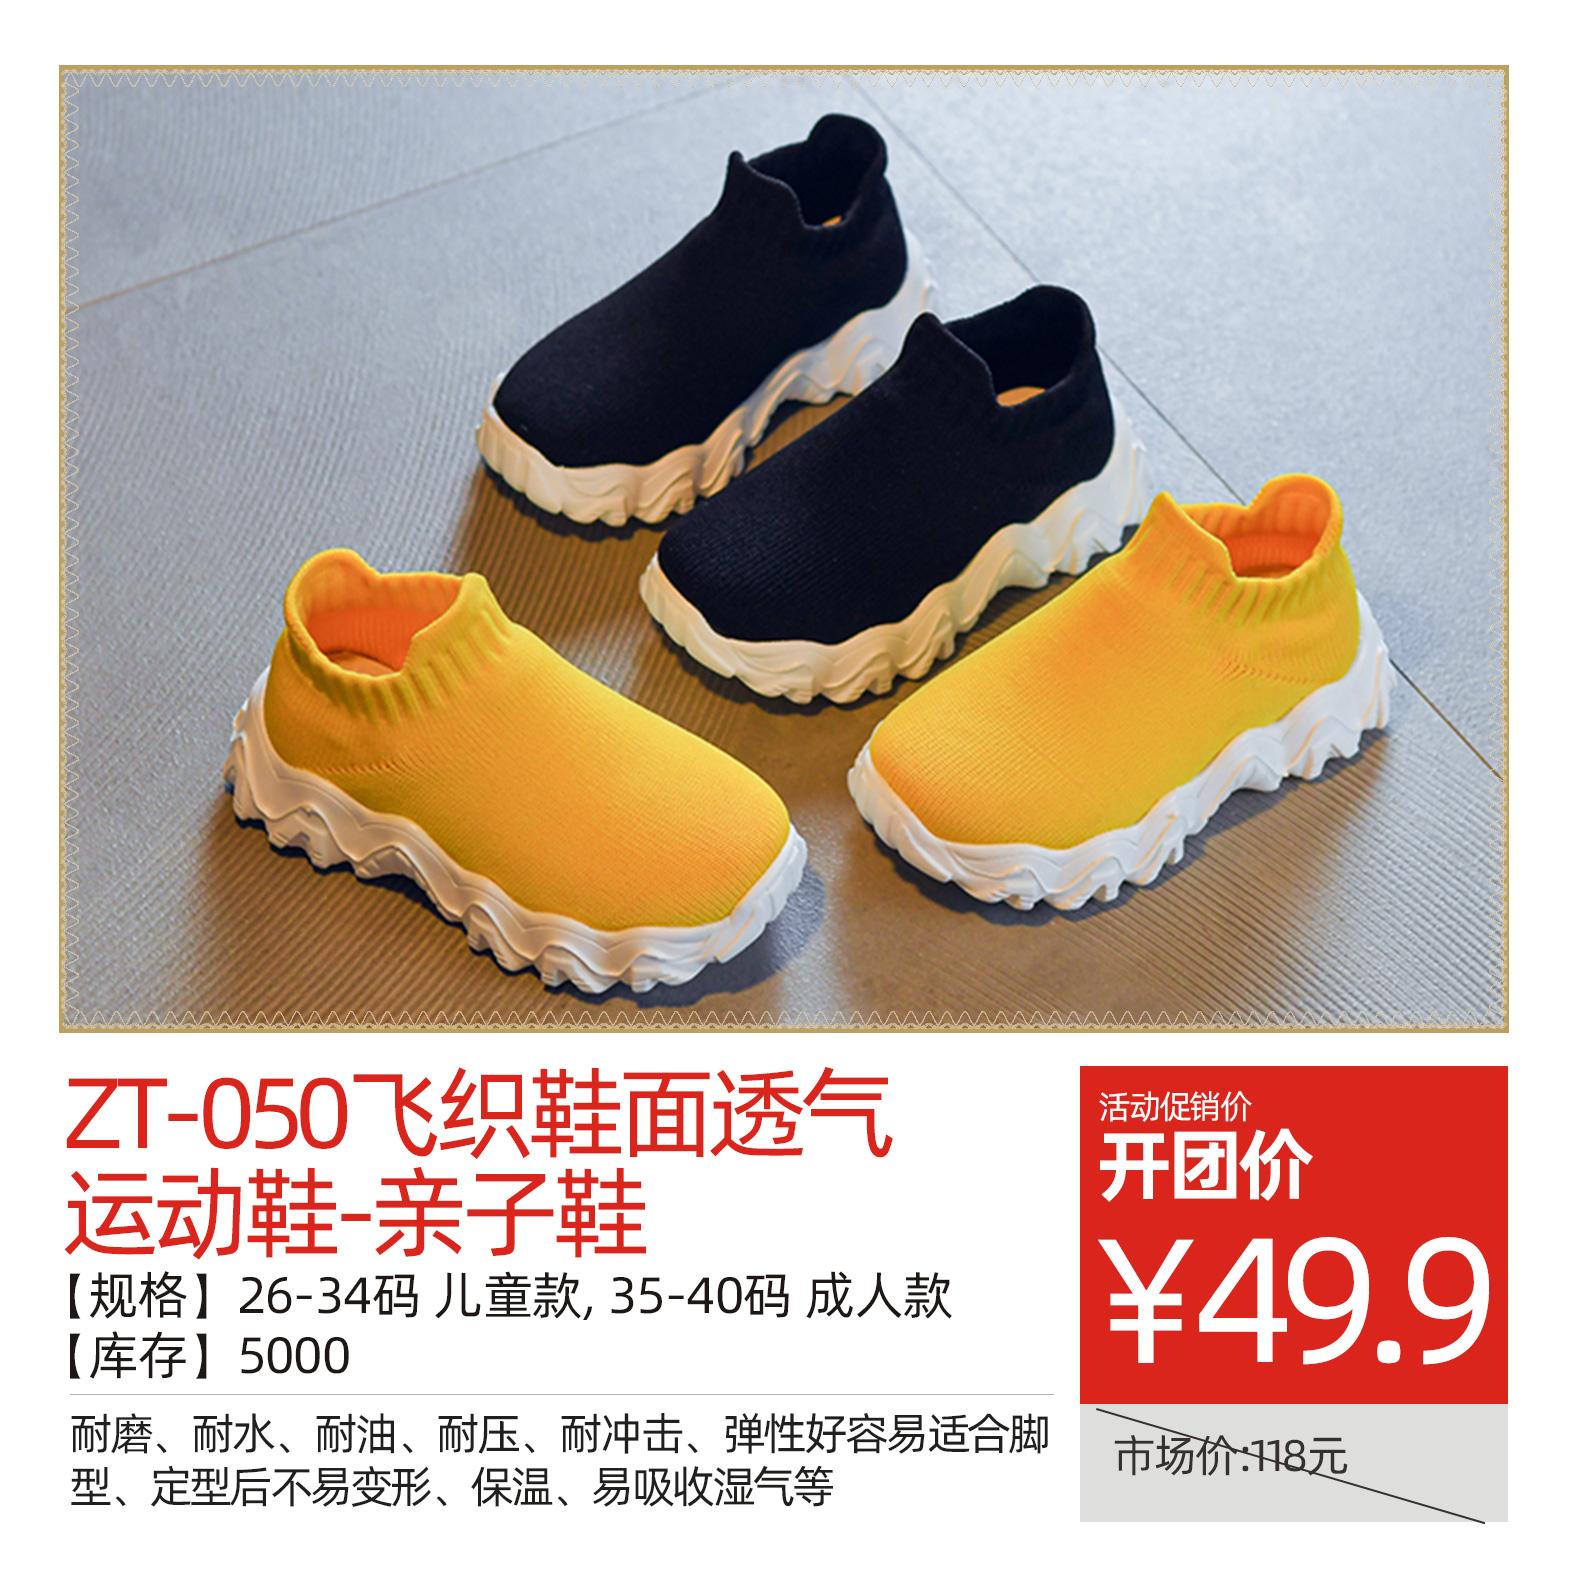 ZT-050飞织鞋面透气运动鞋-亲子鞋